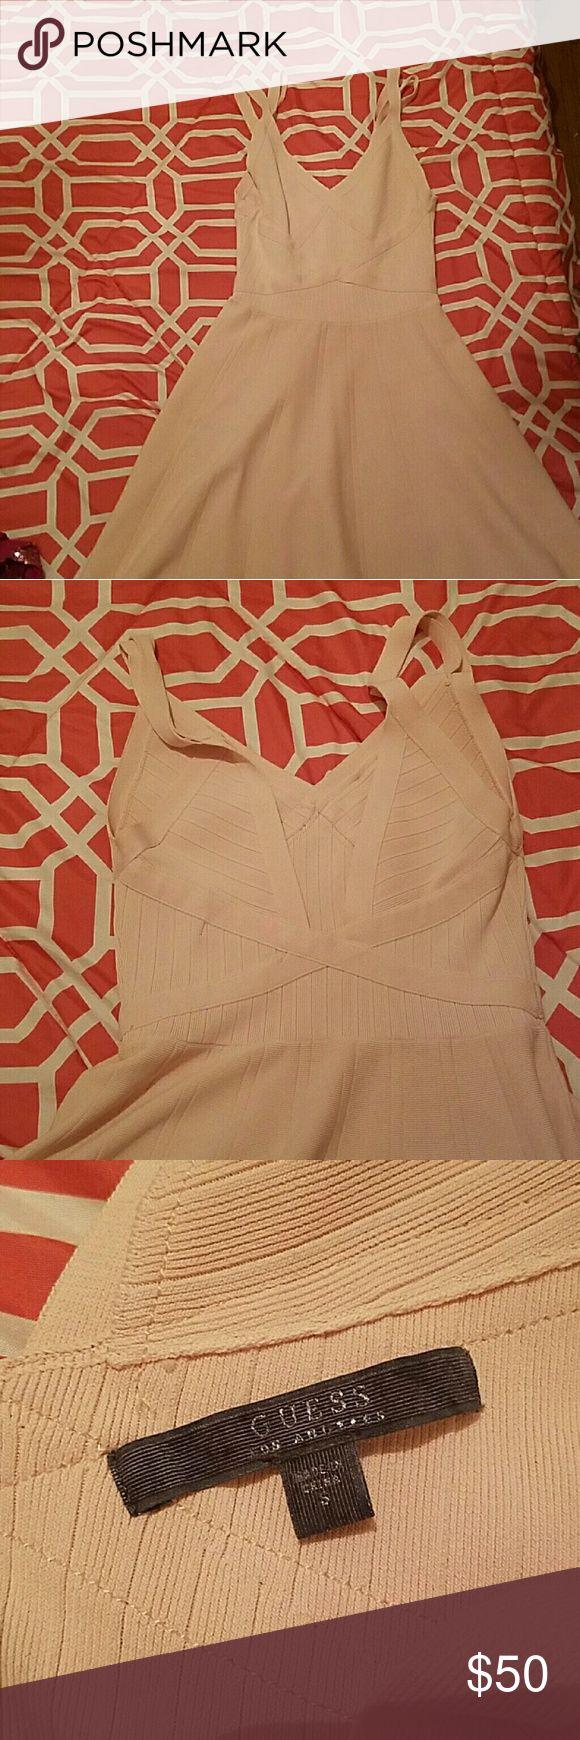 Powder Pink Guess Dress Guess Dress Guess Dresses